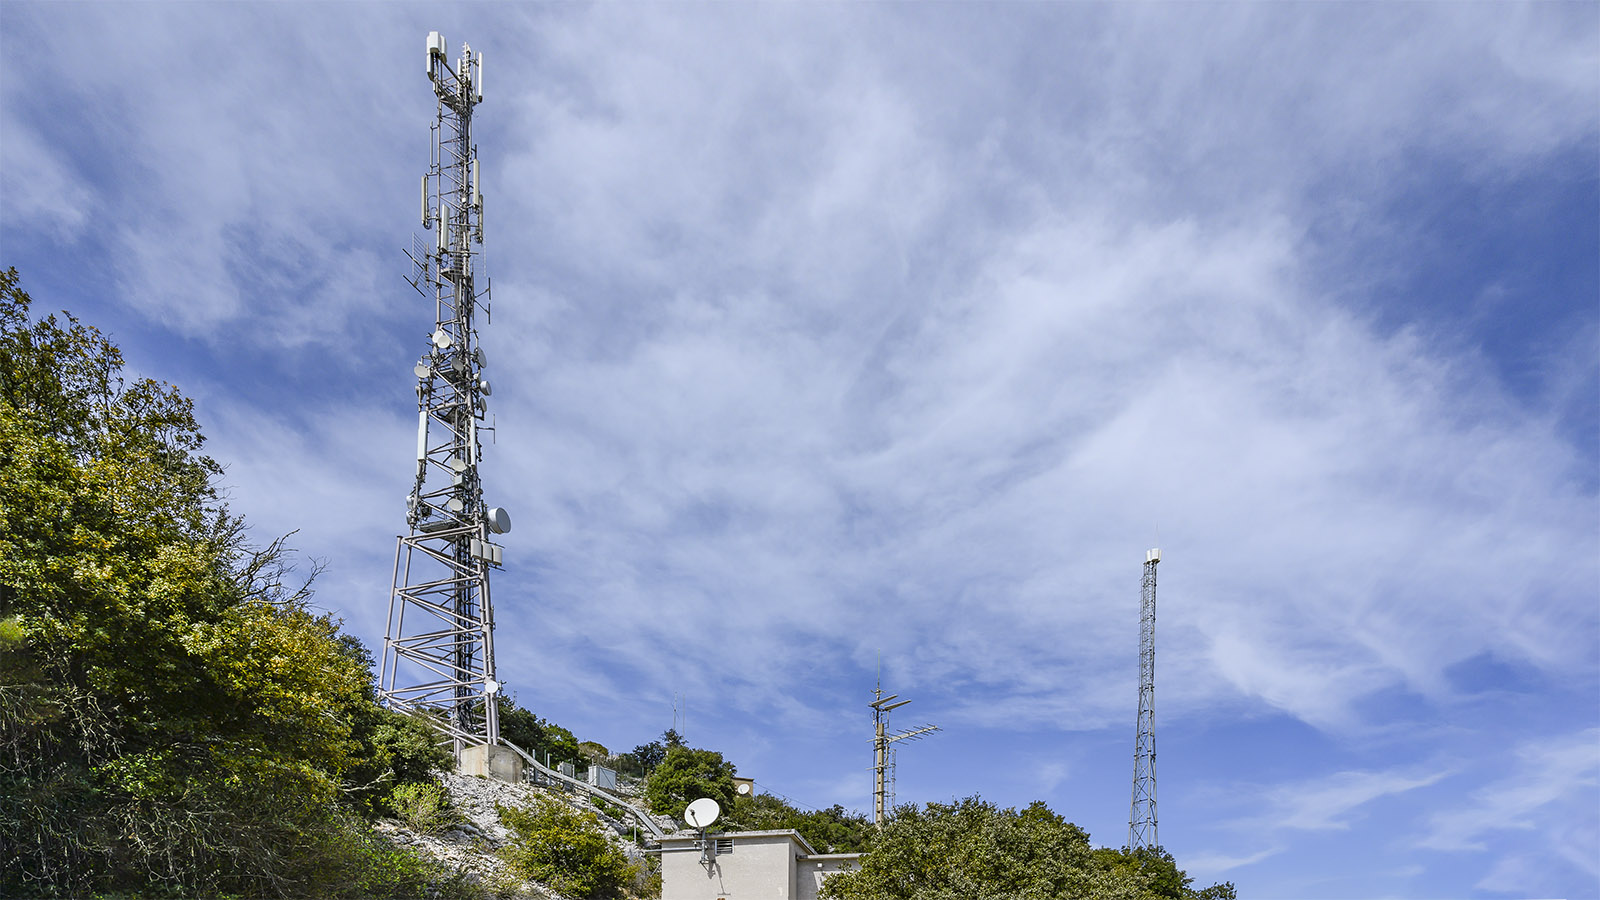 Die Mobilfunkantennen auf der Chaîne de Lesquerde. Foto: Hilke Maunder